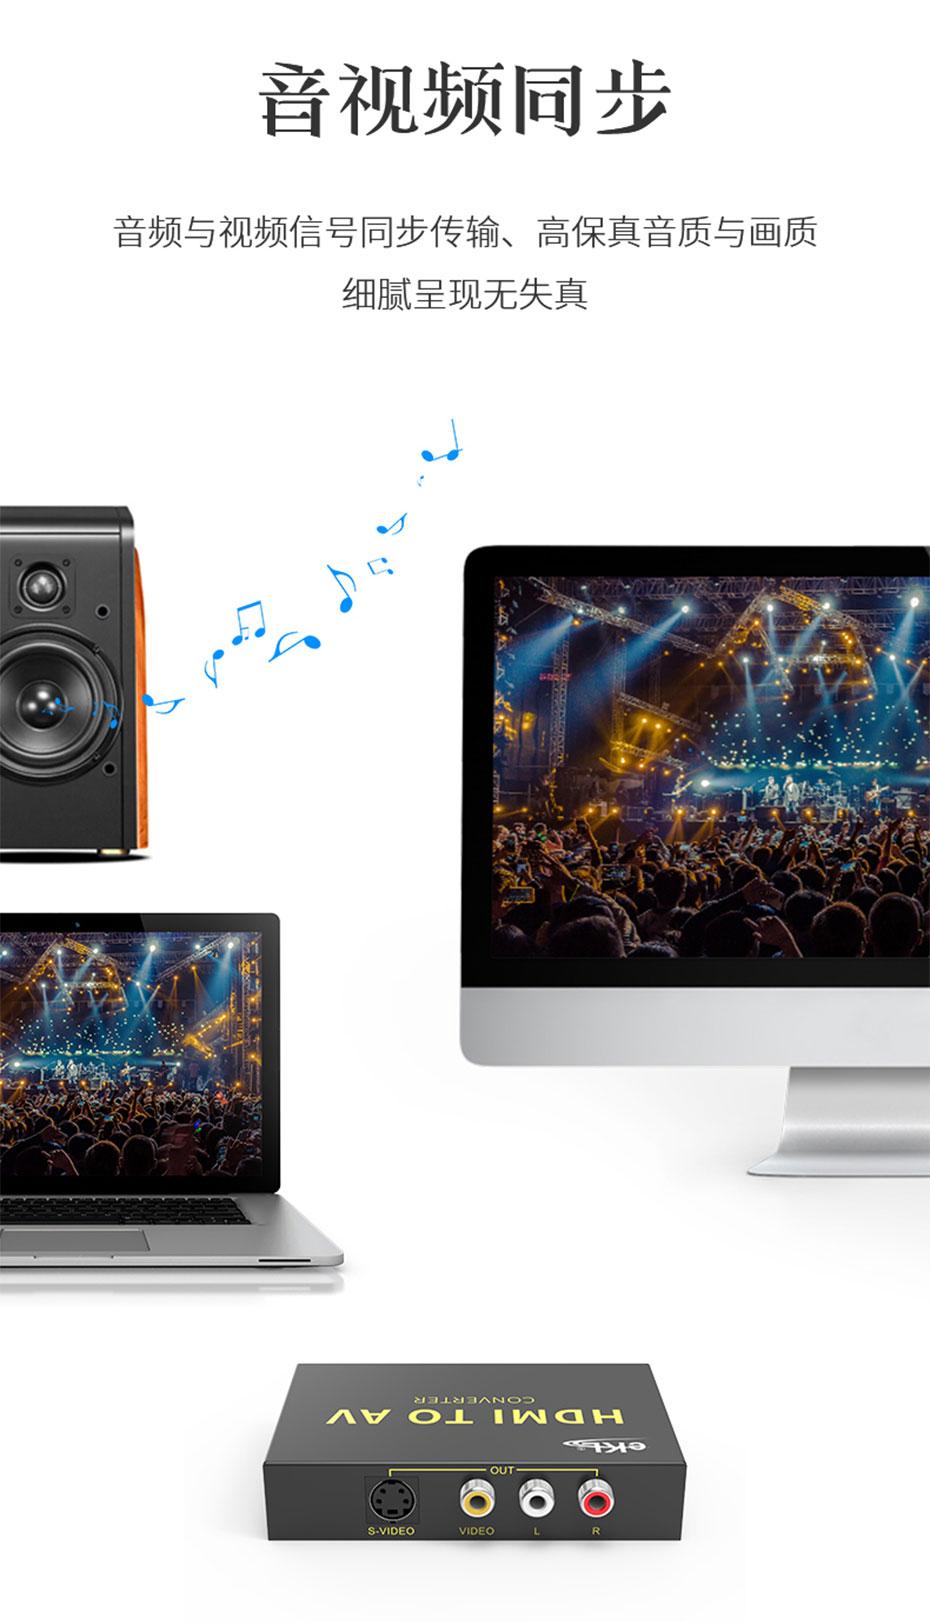 HDMI转S端子/AV转换器HAV支持音频和视频同步传输